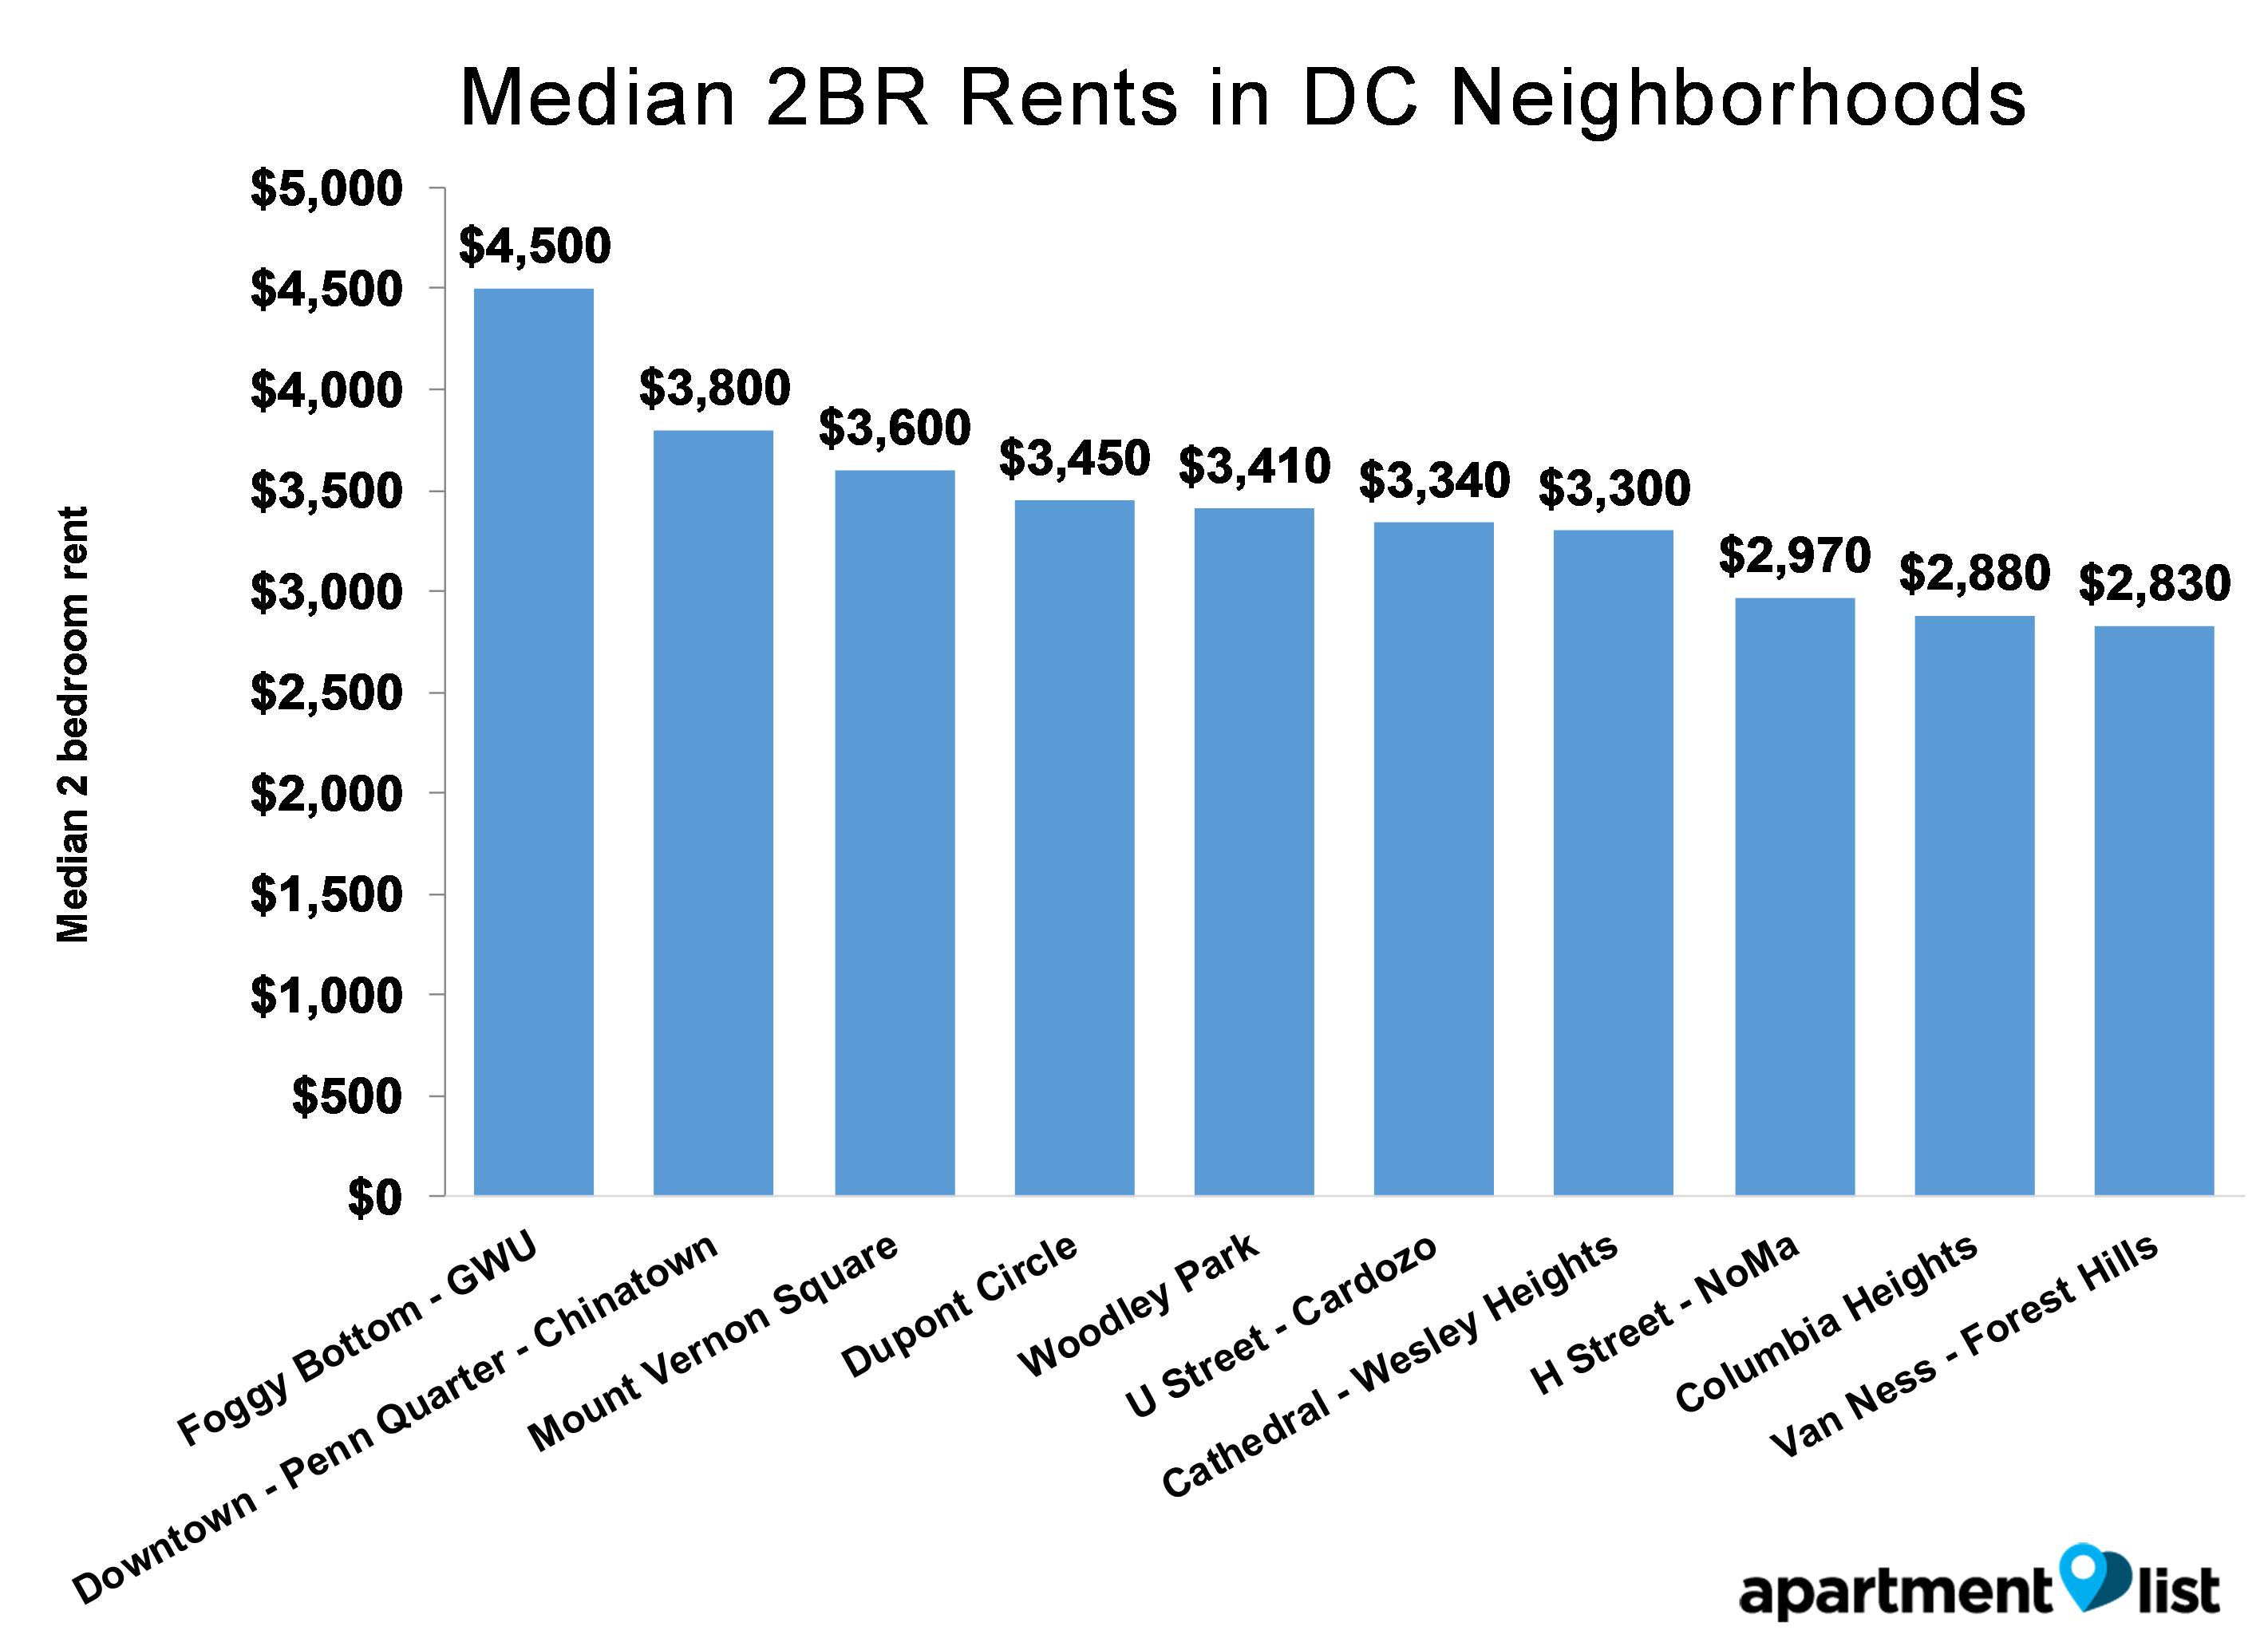 160819 September rent report v3_DC neighborhood rent_043